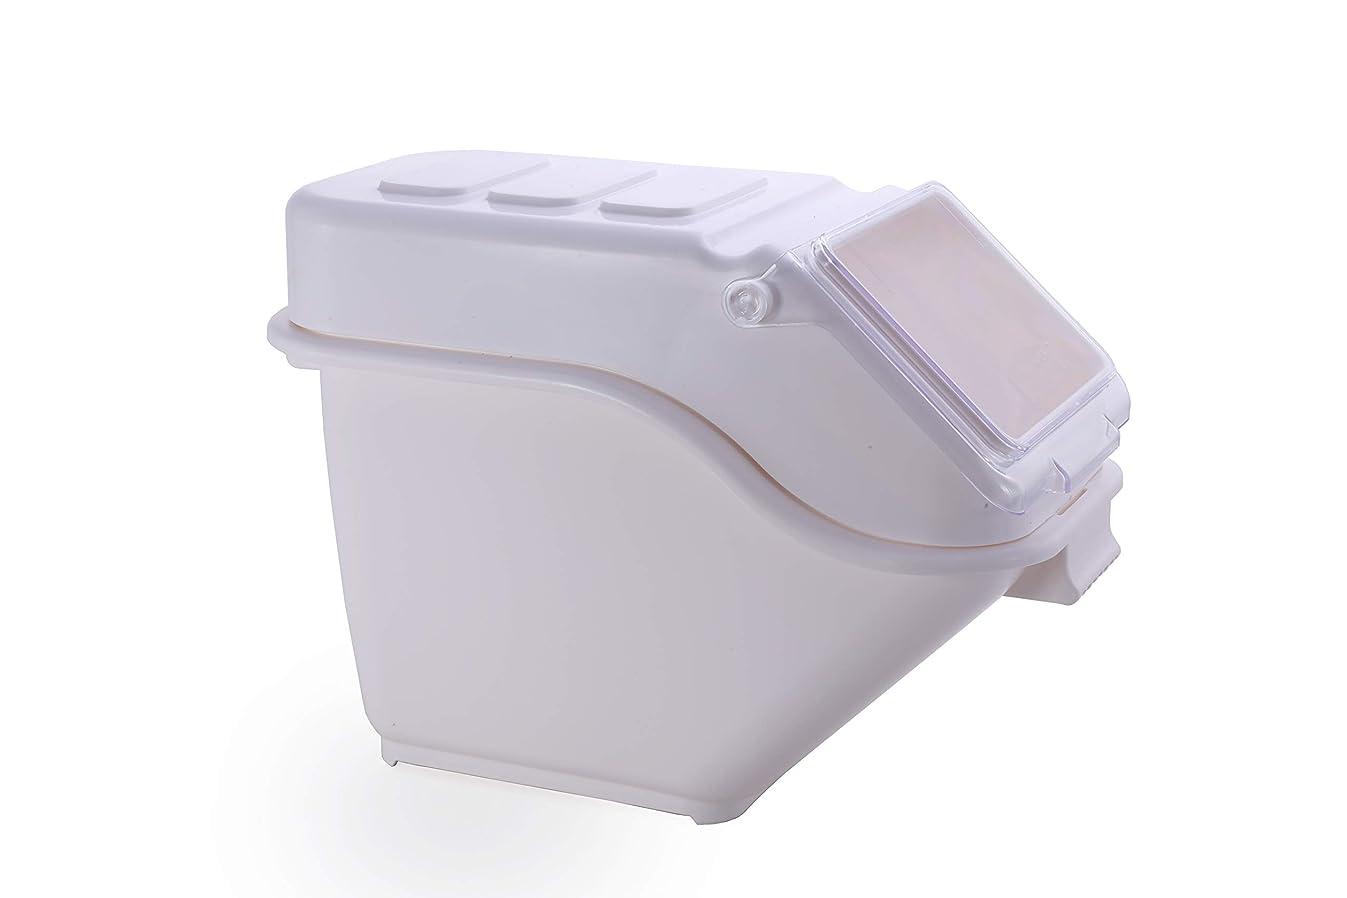 Hakka Commercial 100-cup ProSave Shelf-Storage Ingredient Bin with Scoop,Stackable